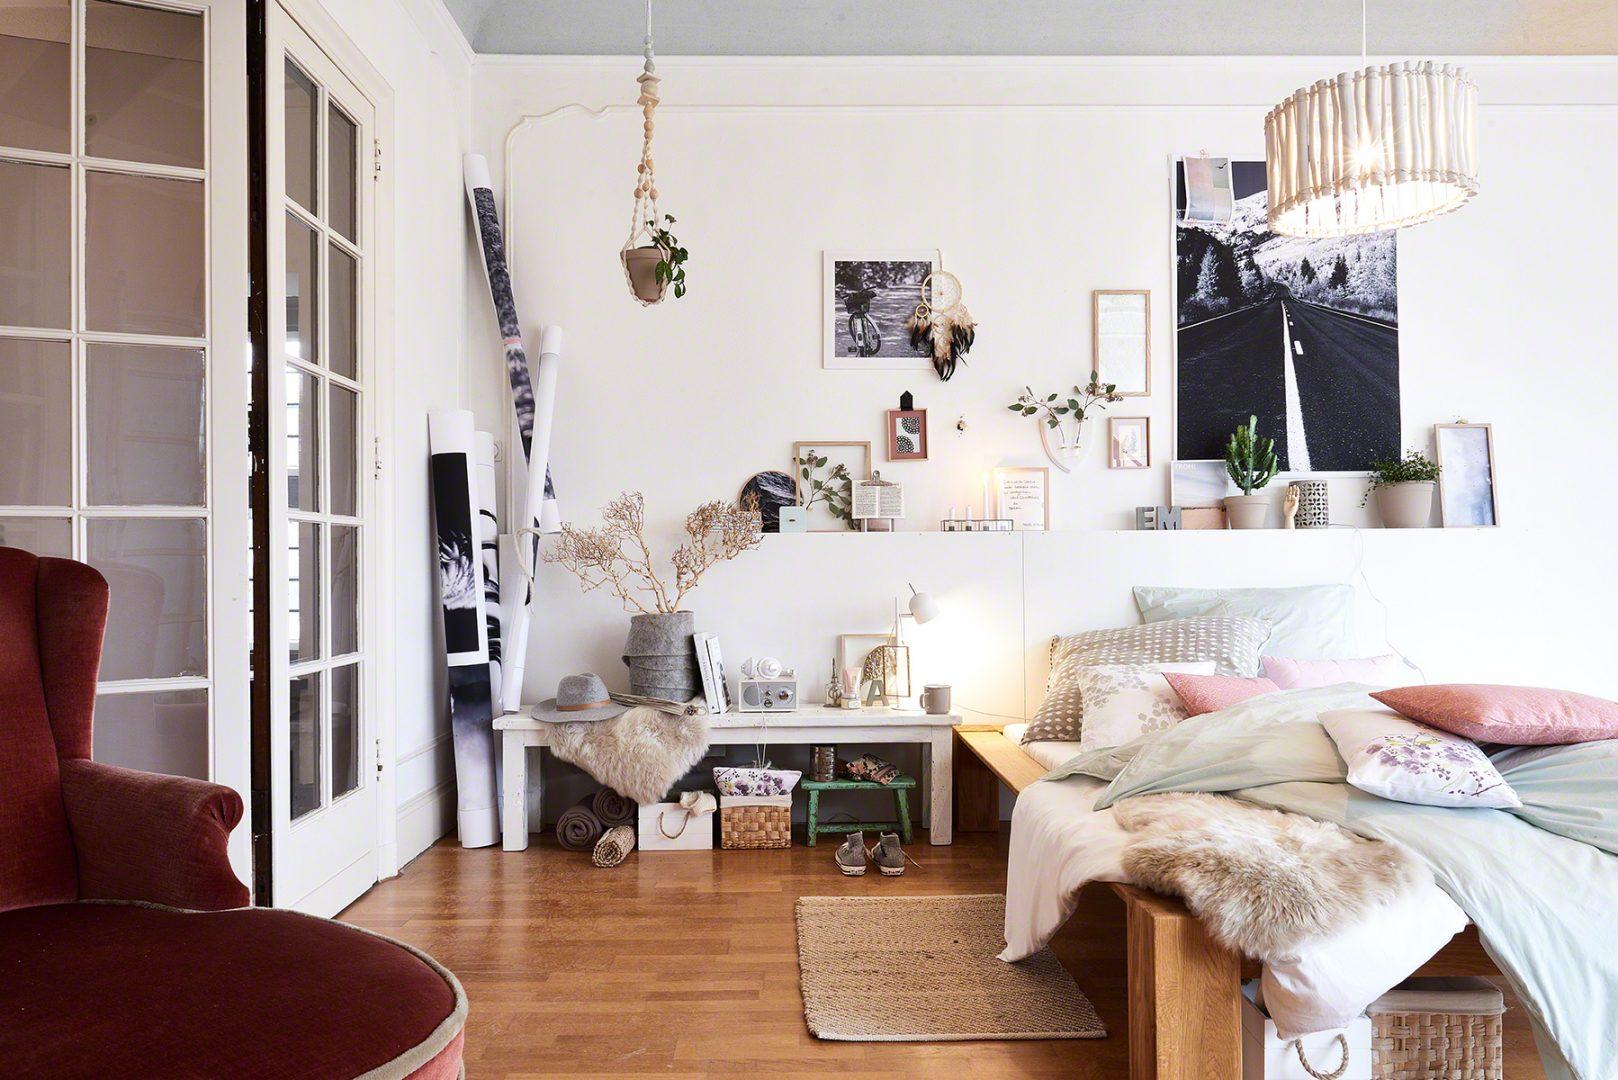 sessel gemtlich gemtlicher lesesessel sofa sessel kombination genial ikea outdoor mbel. Black Bedroom Furniture Sets. Home Design Ideas